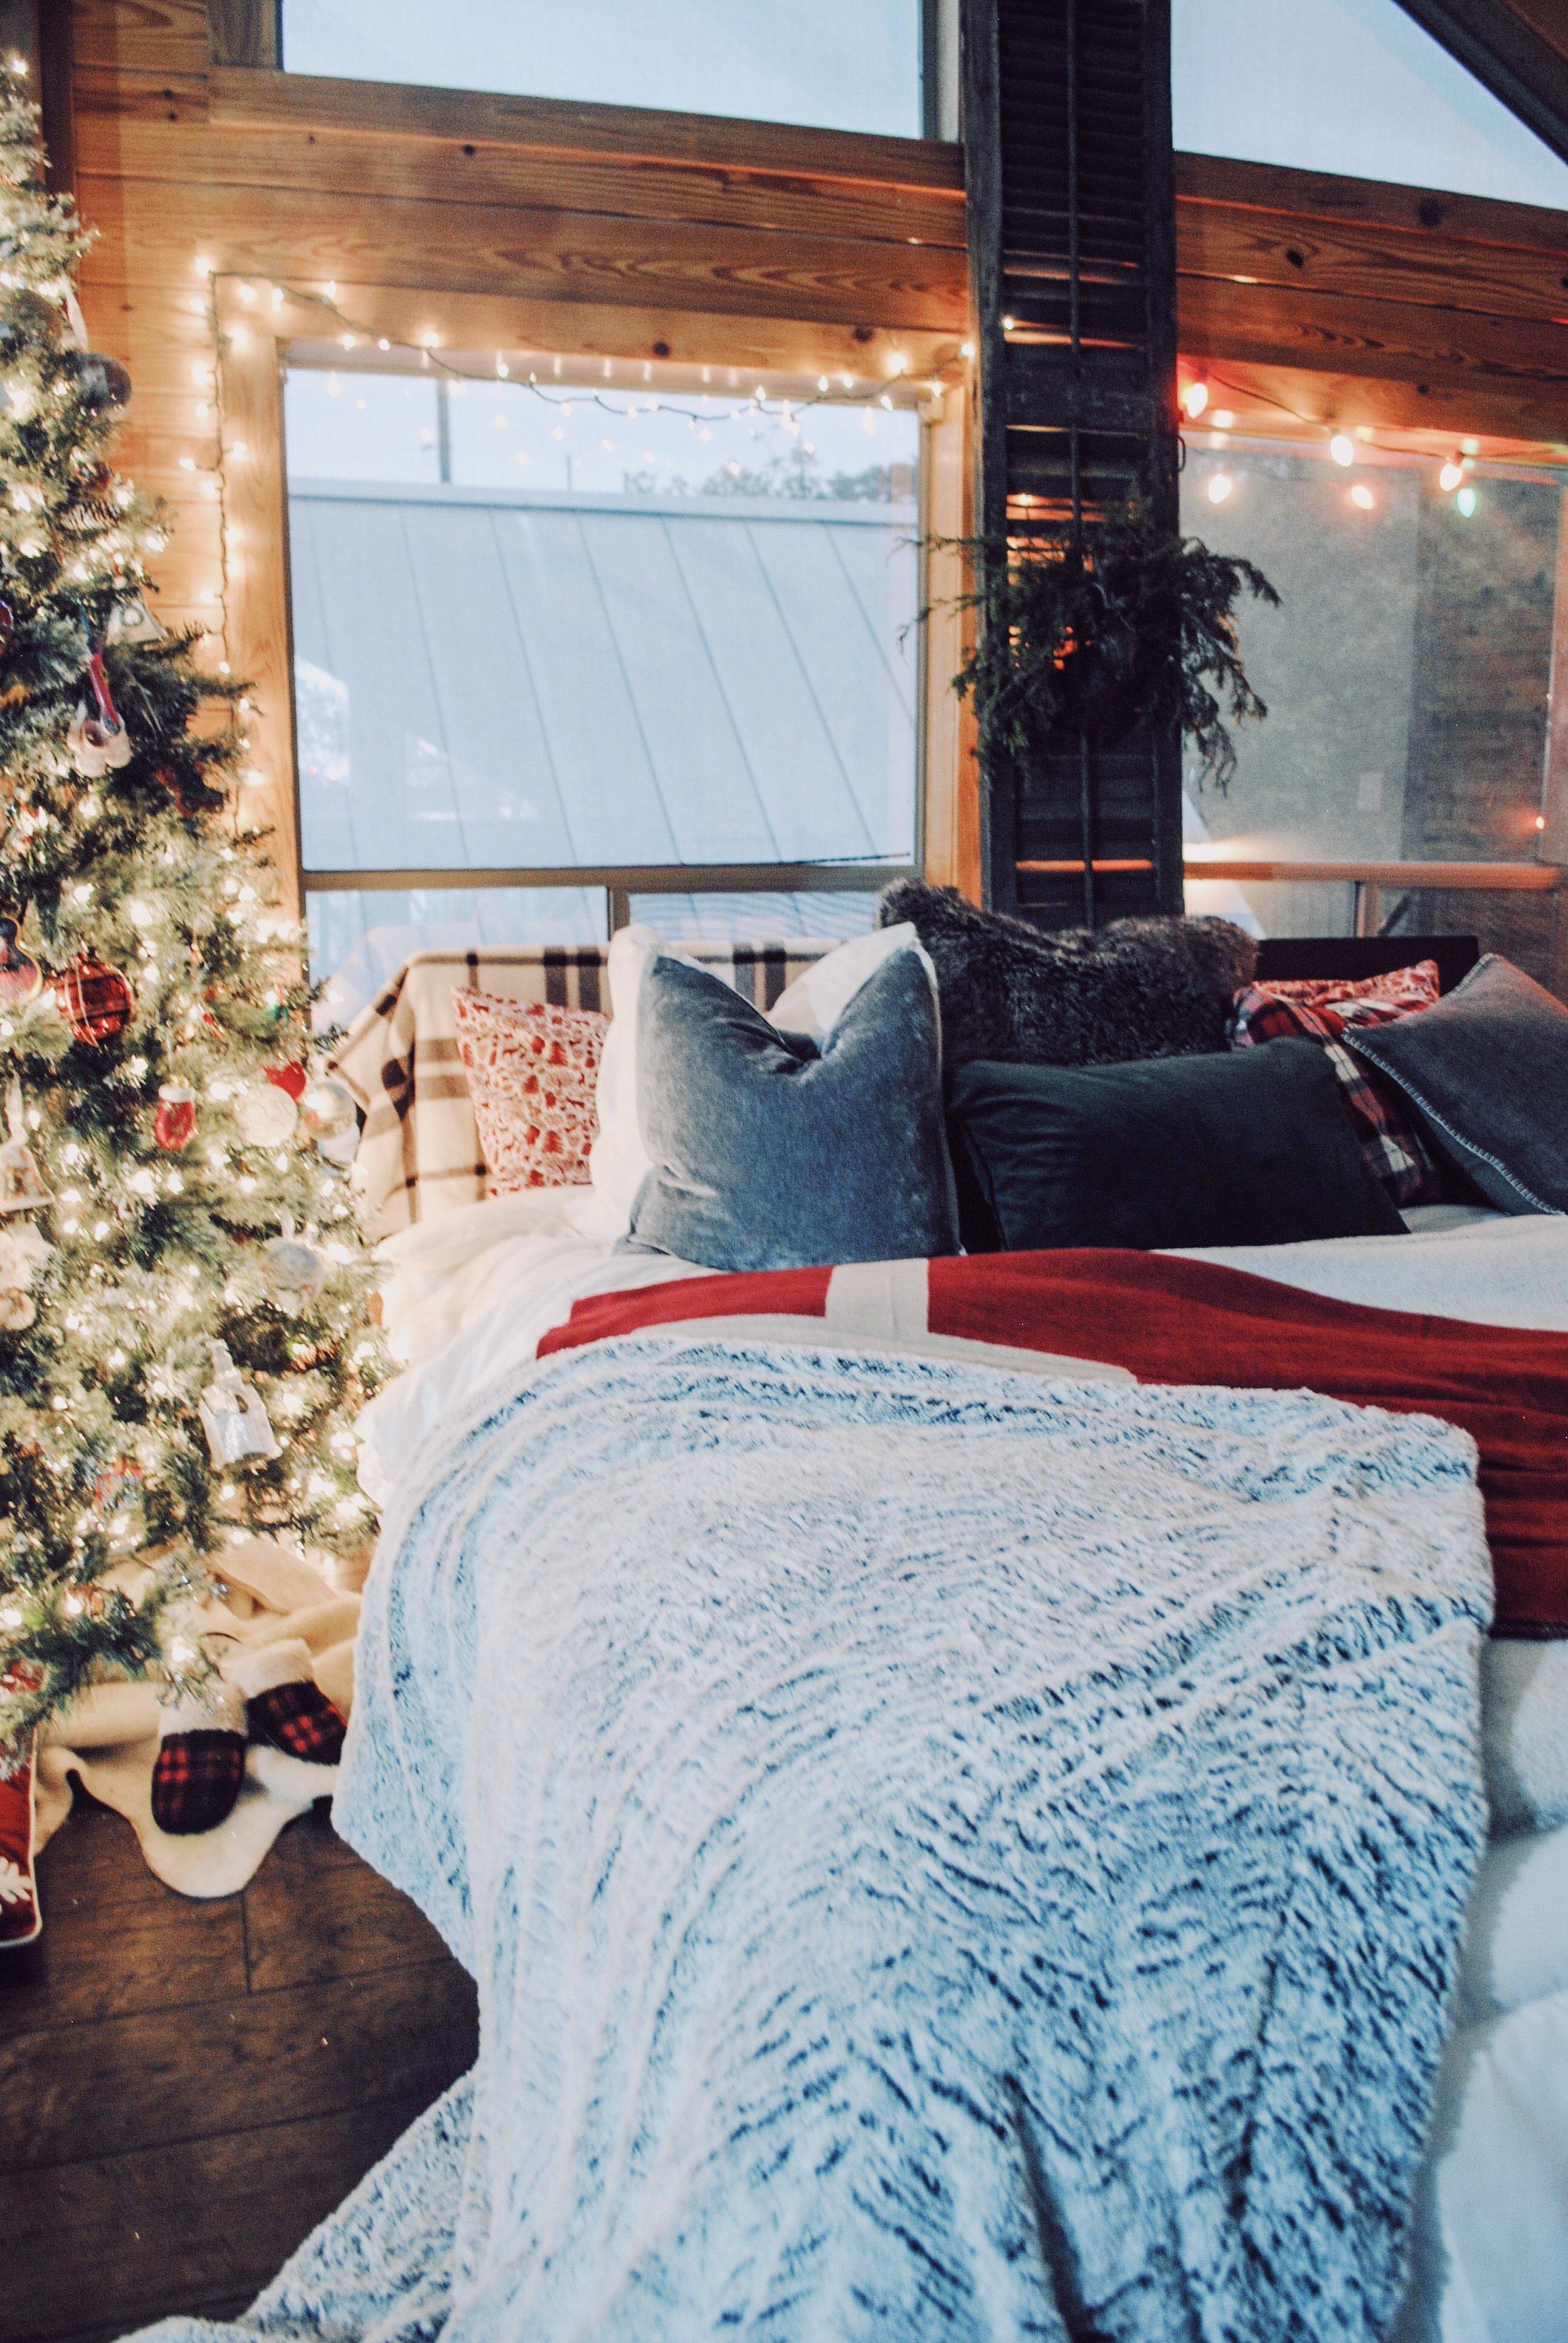 Photo Dec 07, 9 48 47 AM.jpg